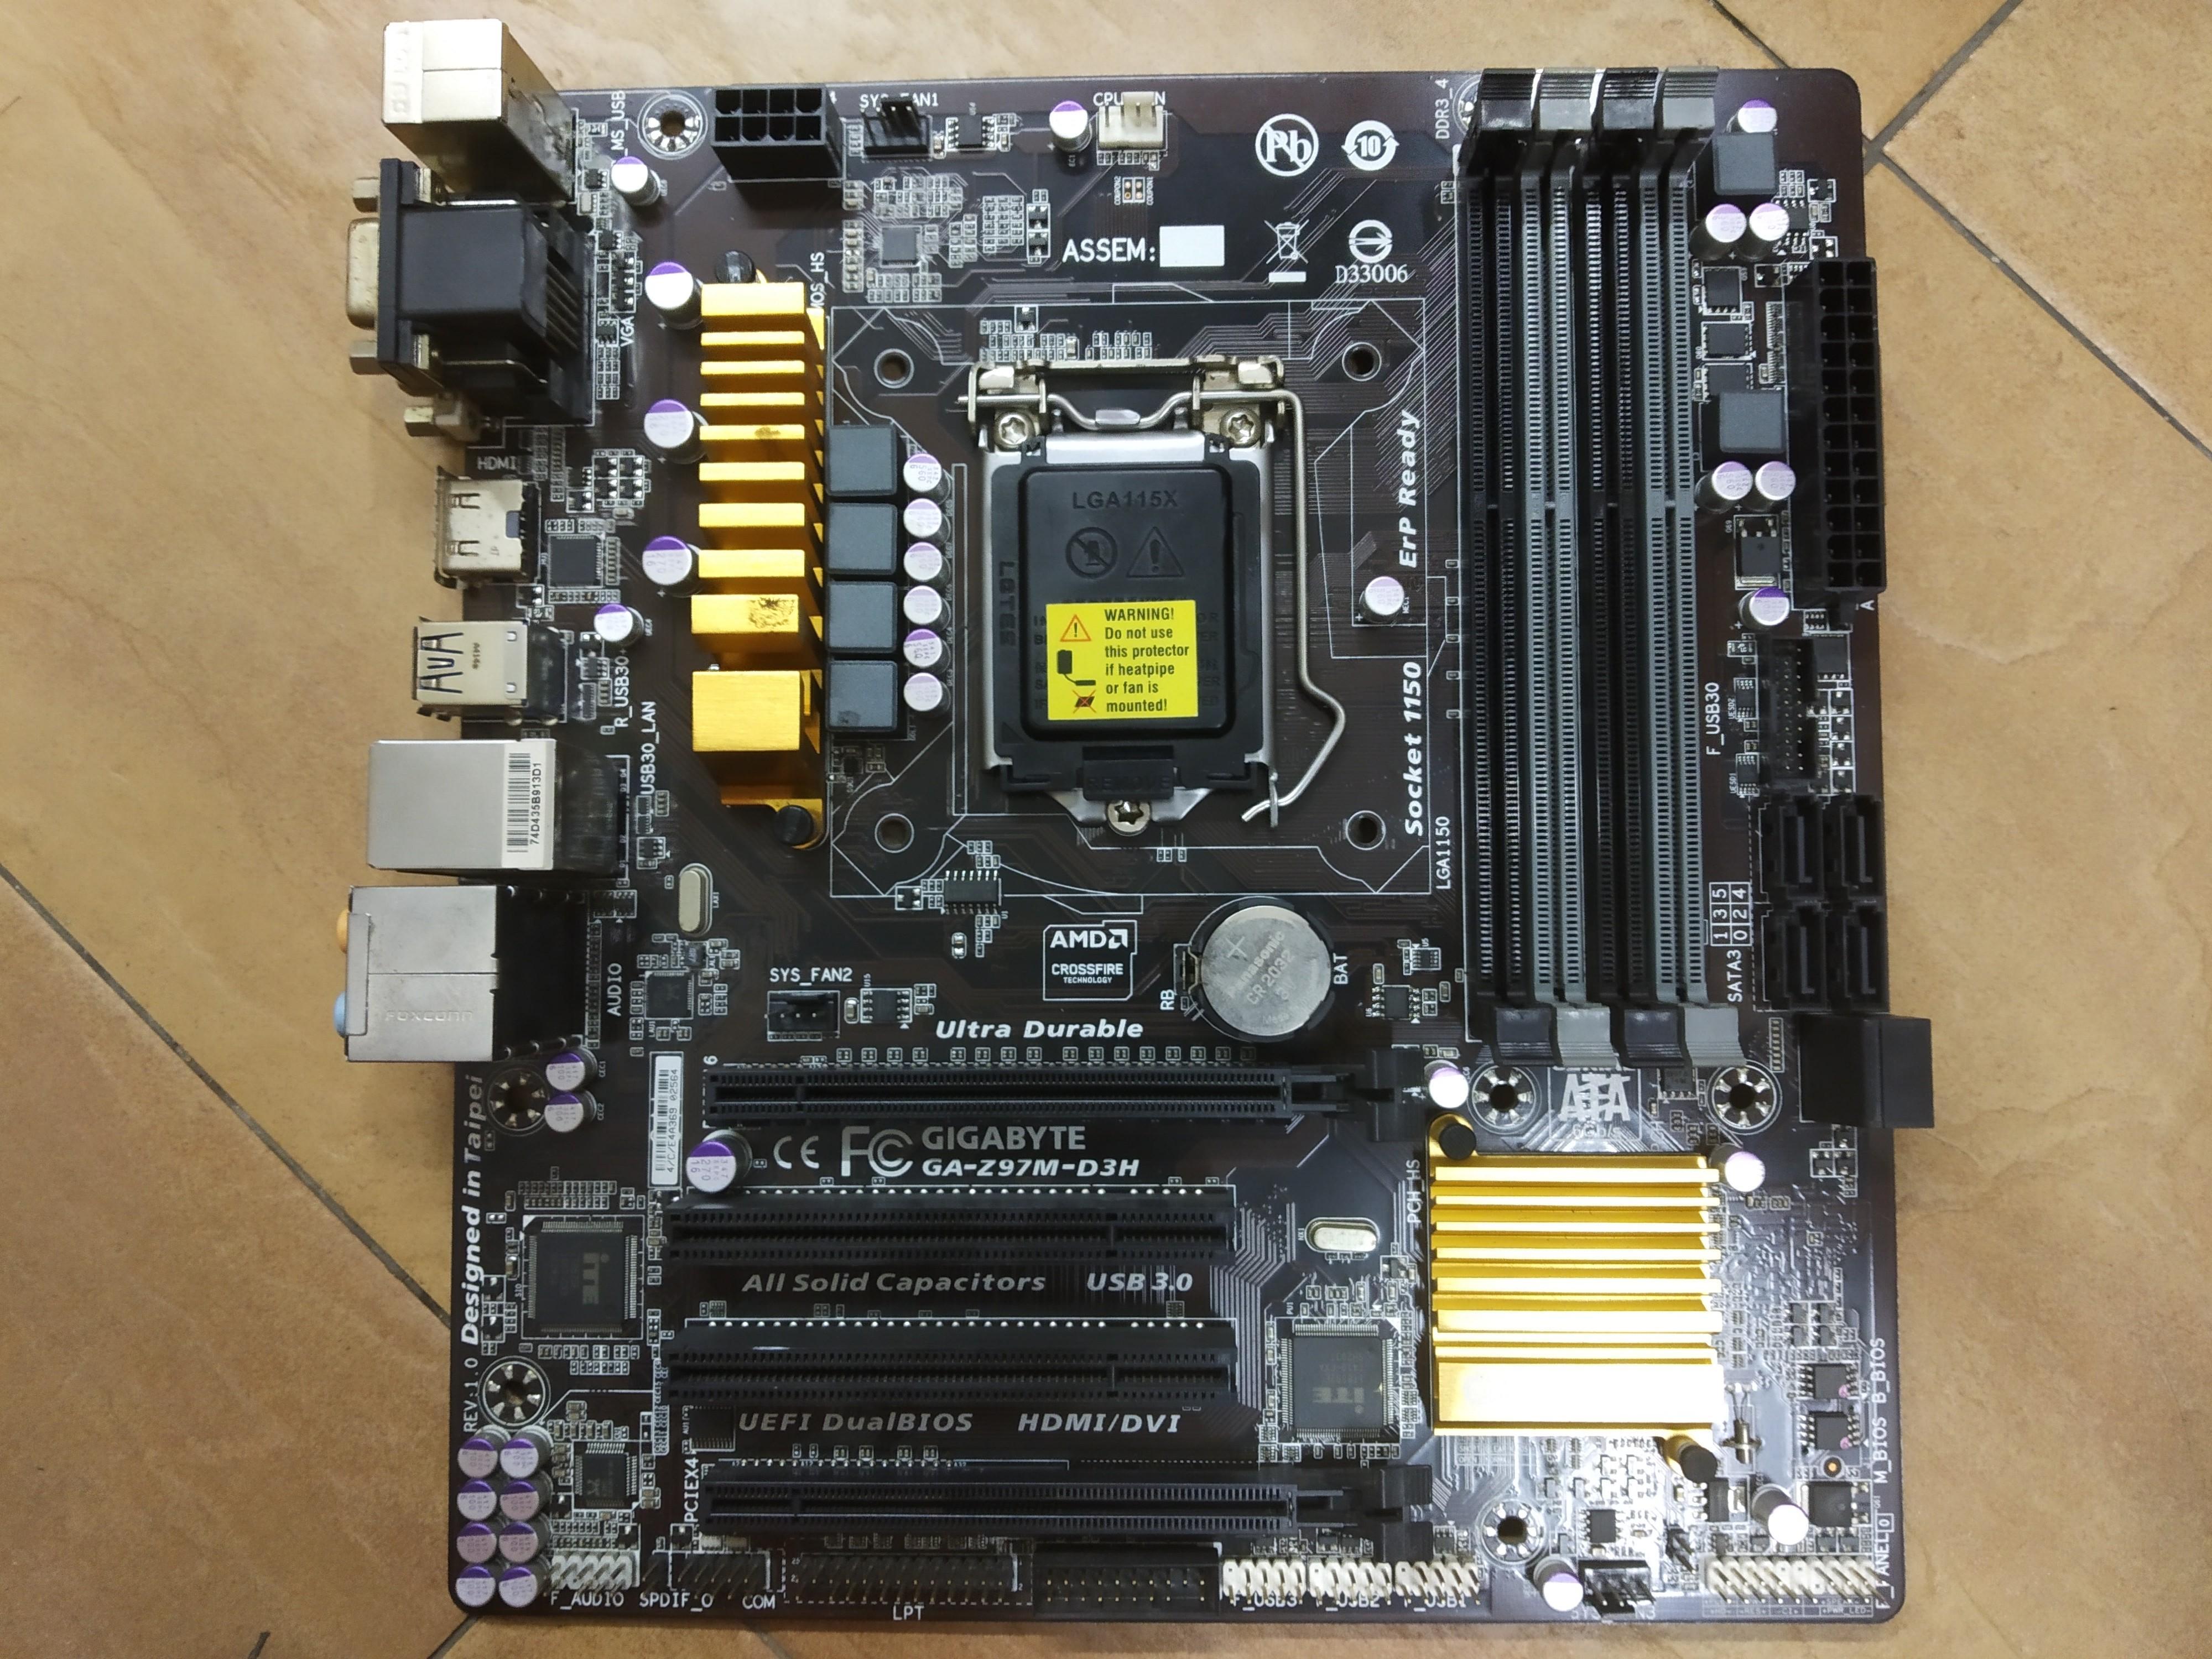 Gigabyte GA-Z97M-D3H, Electronics, Computer Parts